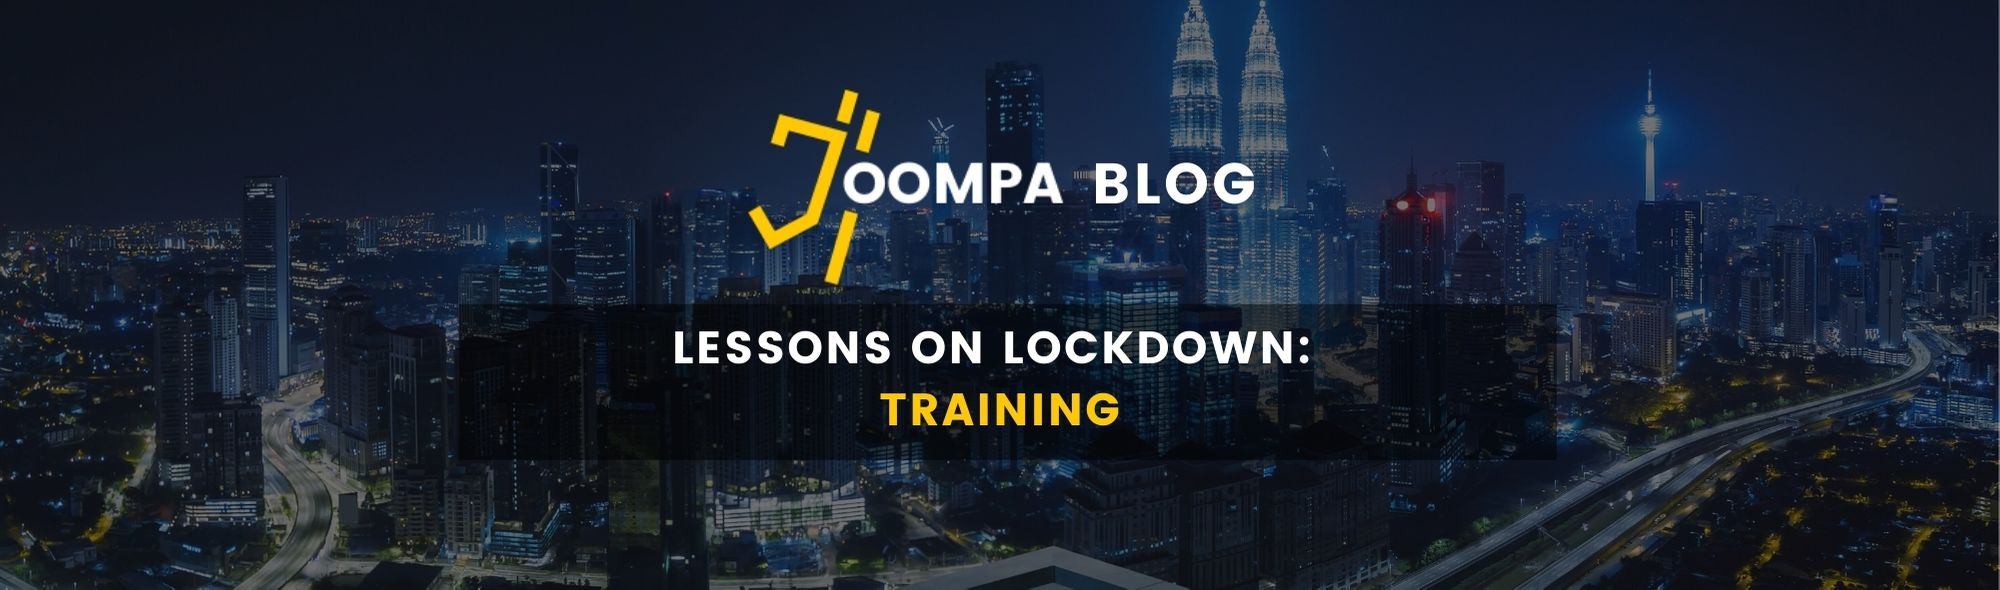 Lessons on Lockdown: Training